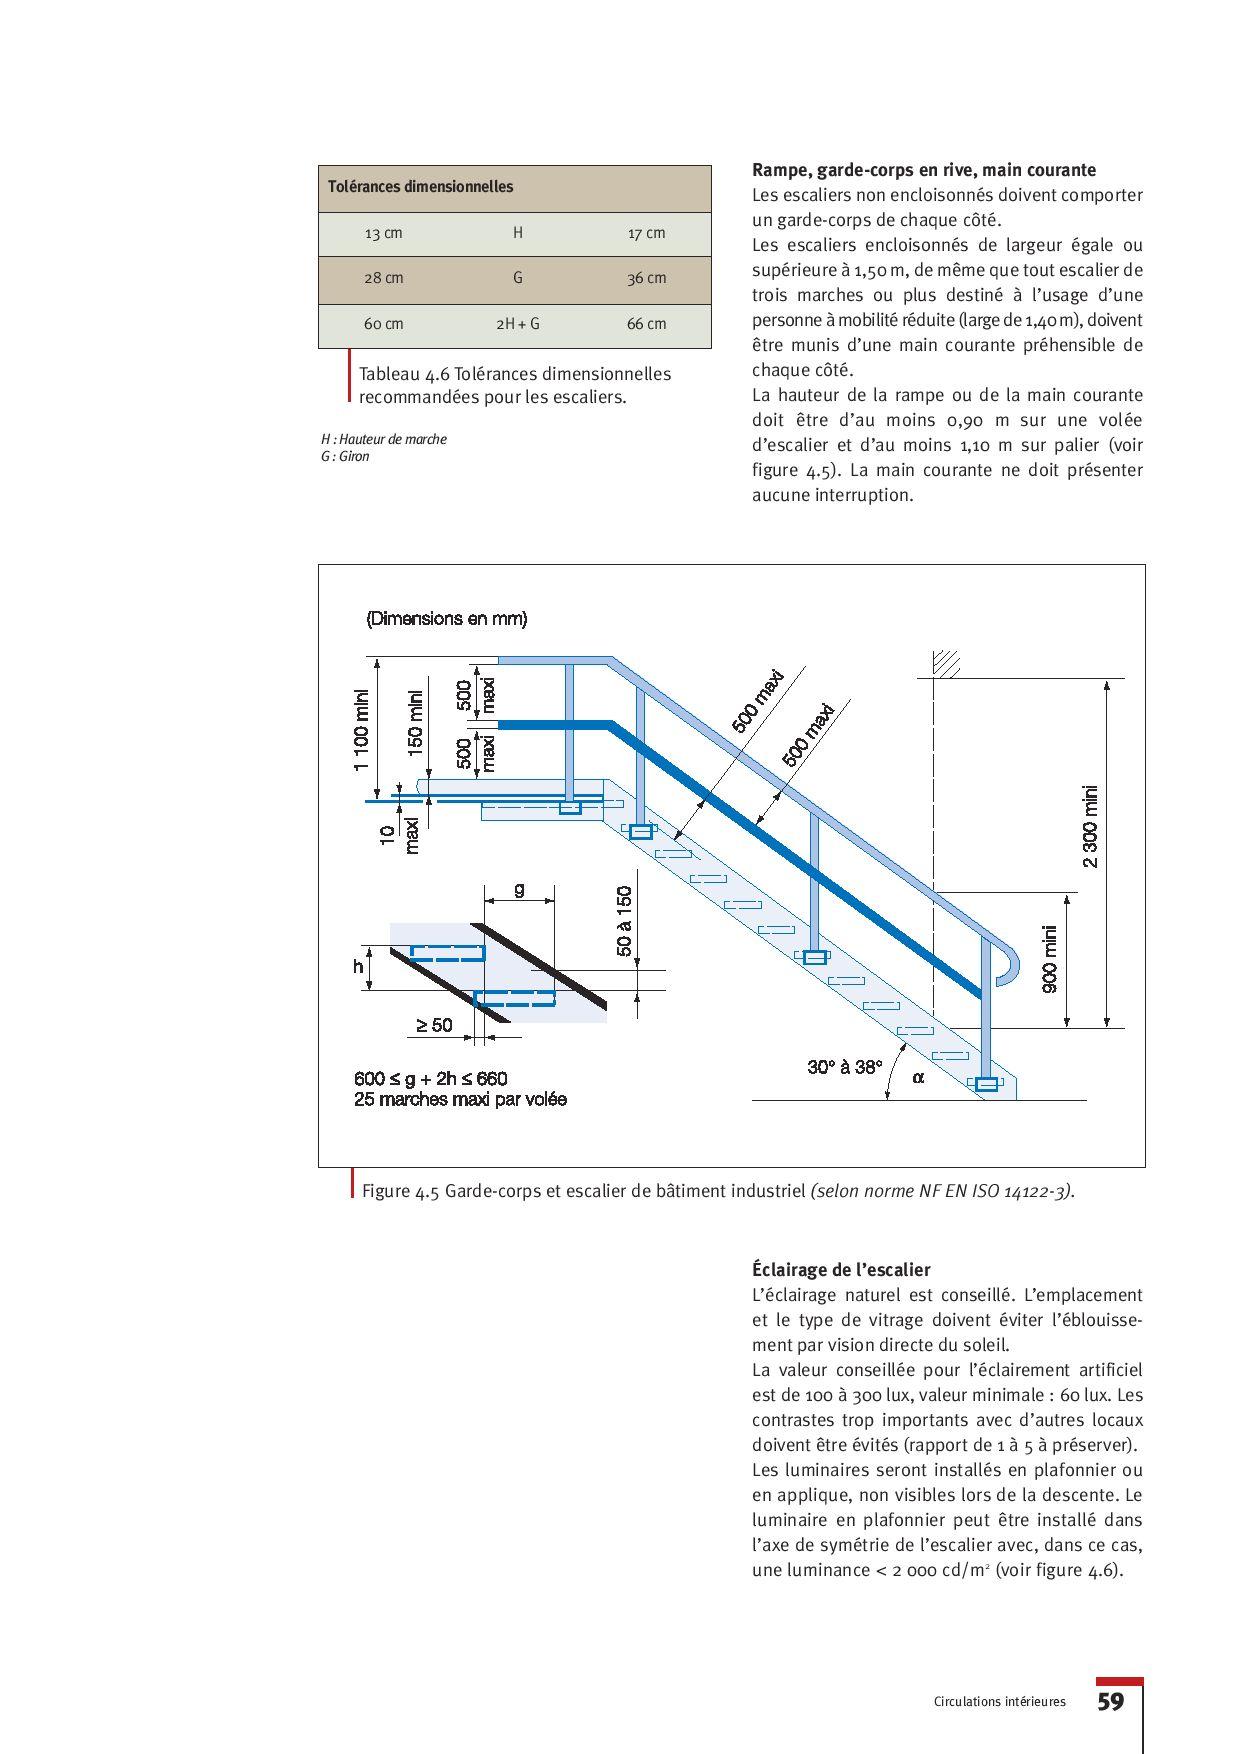 Nf En Iso 14122-3 : 14122-3, Guide, Ed975, Gsegse, Issuu